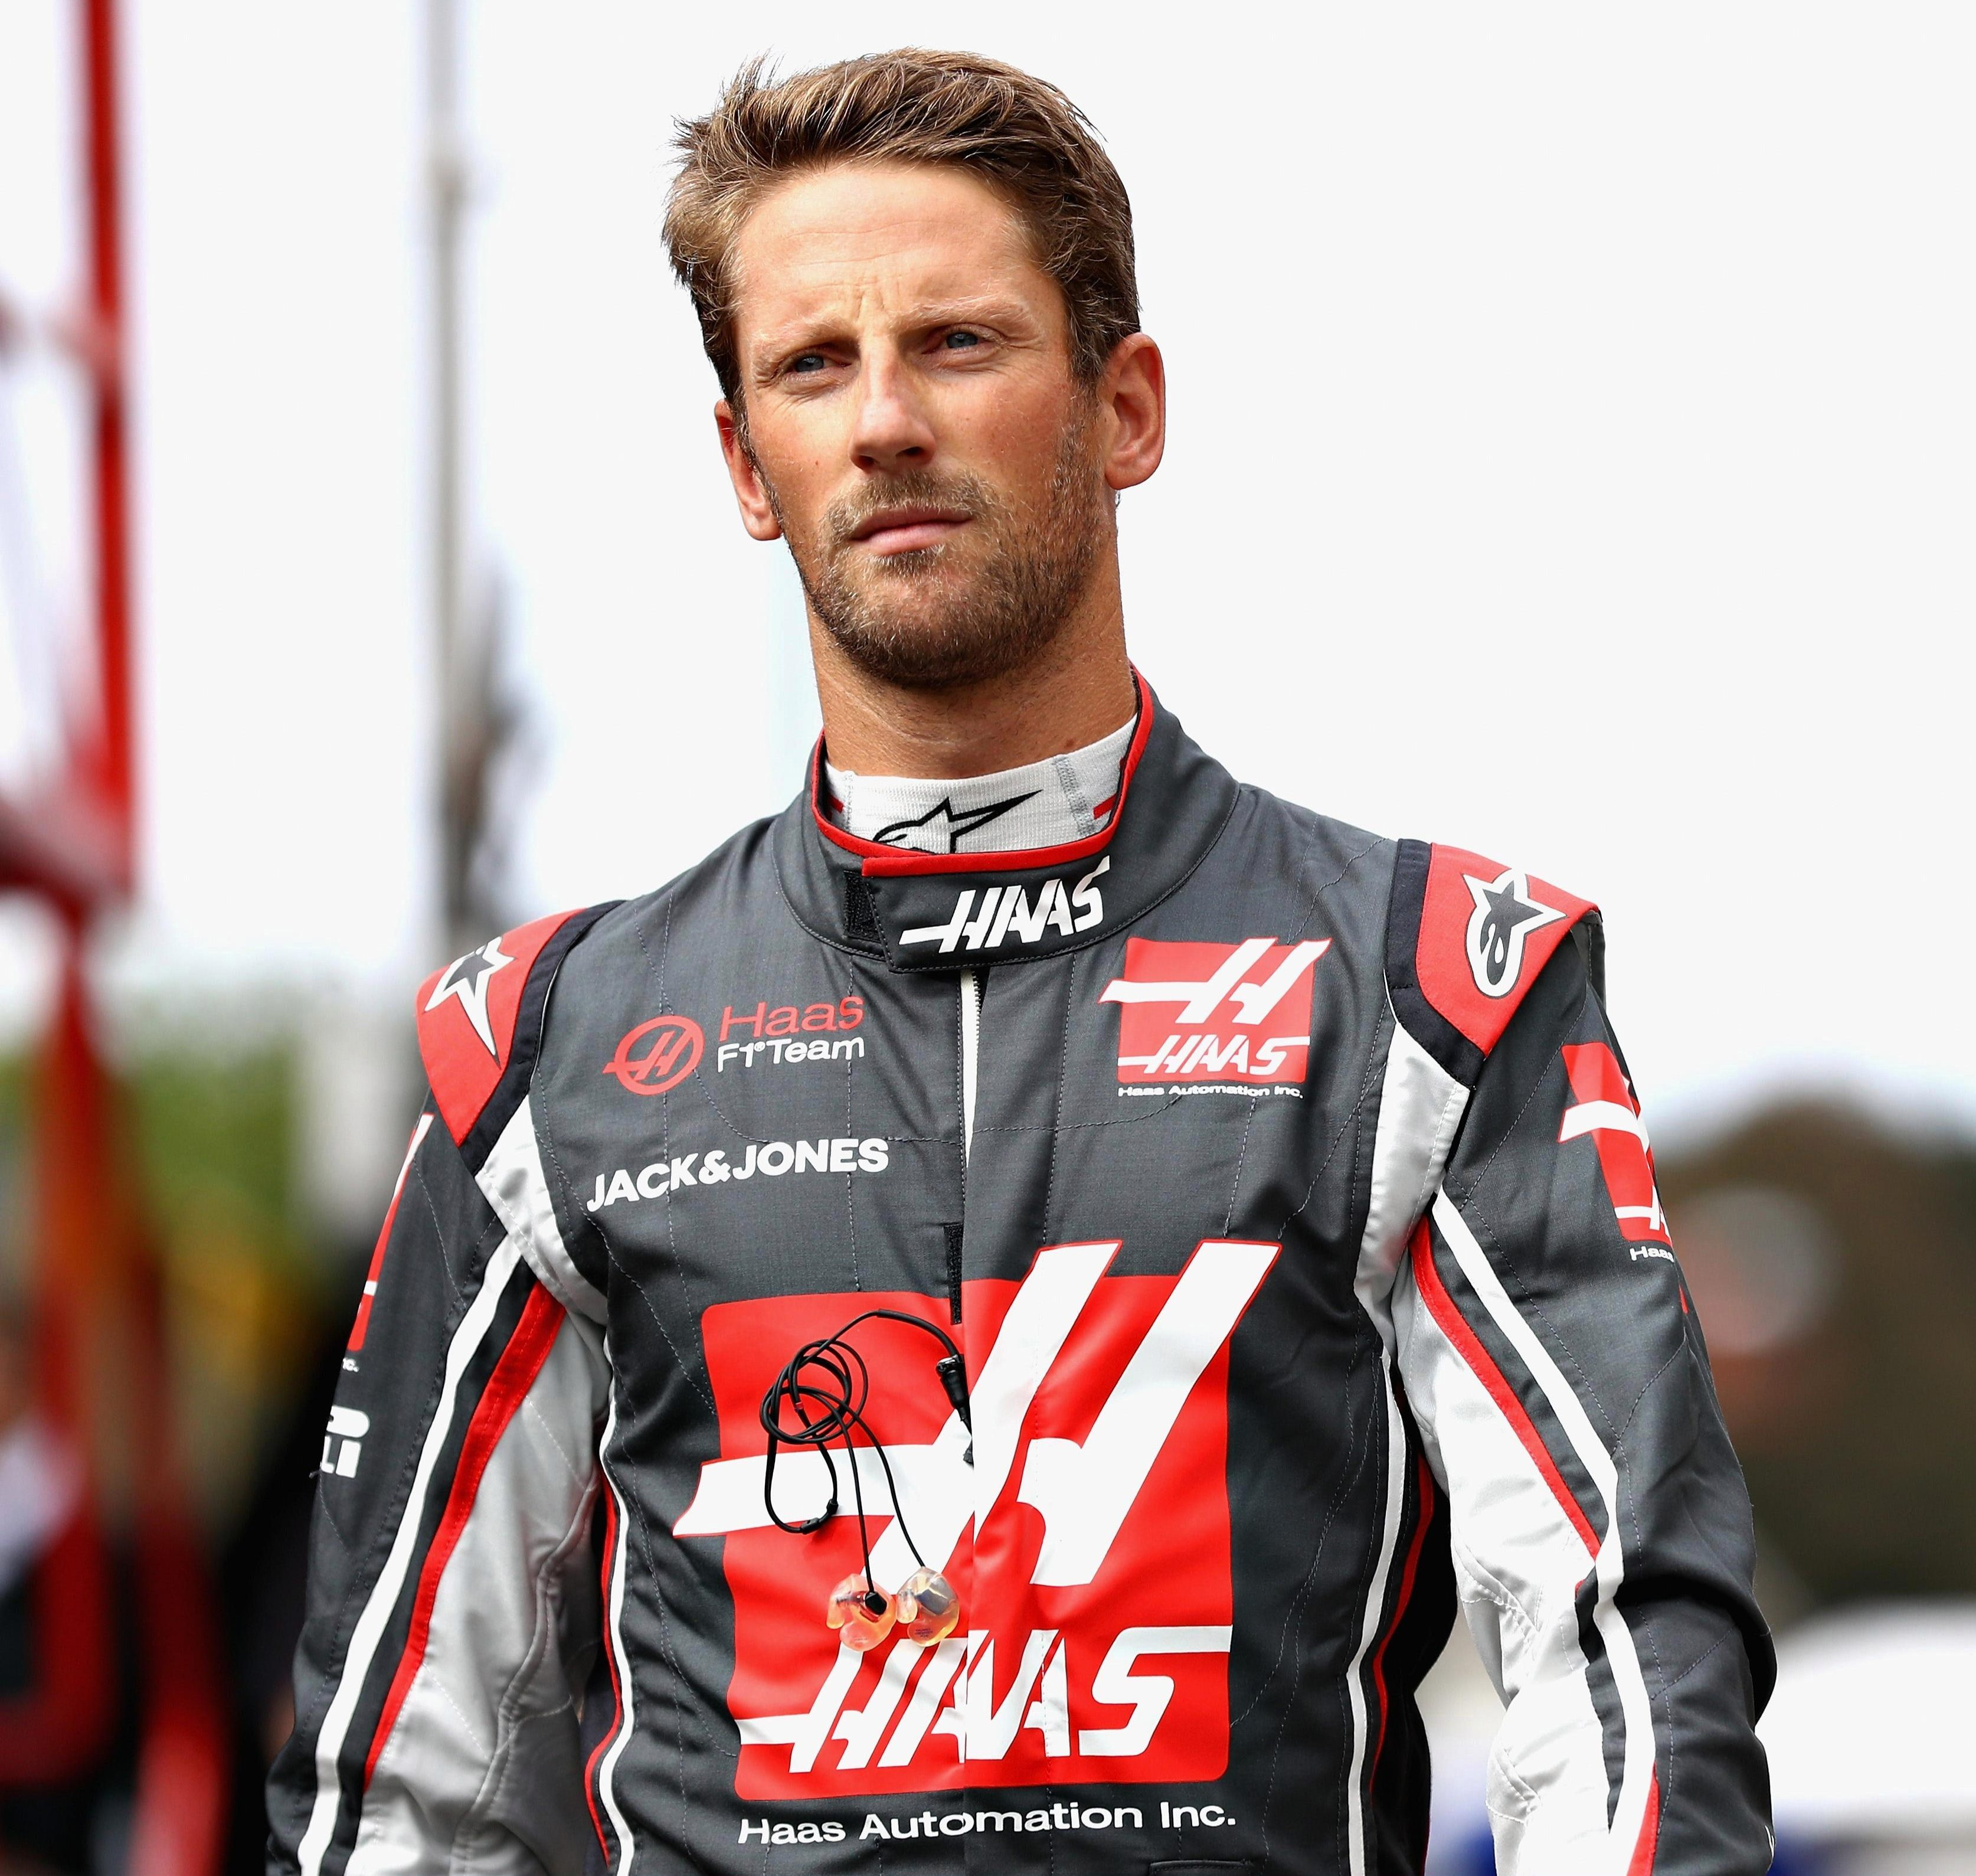 Romain Grosjean's Haas has been disqualified from the Italian Grand Prix